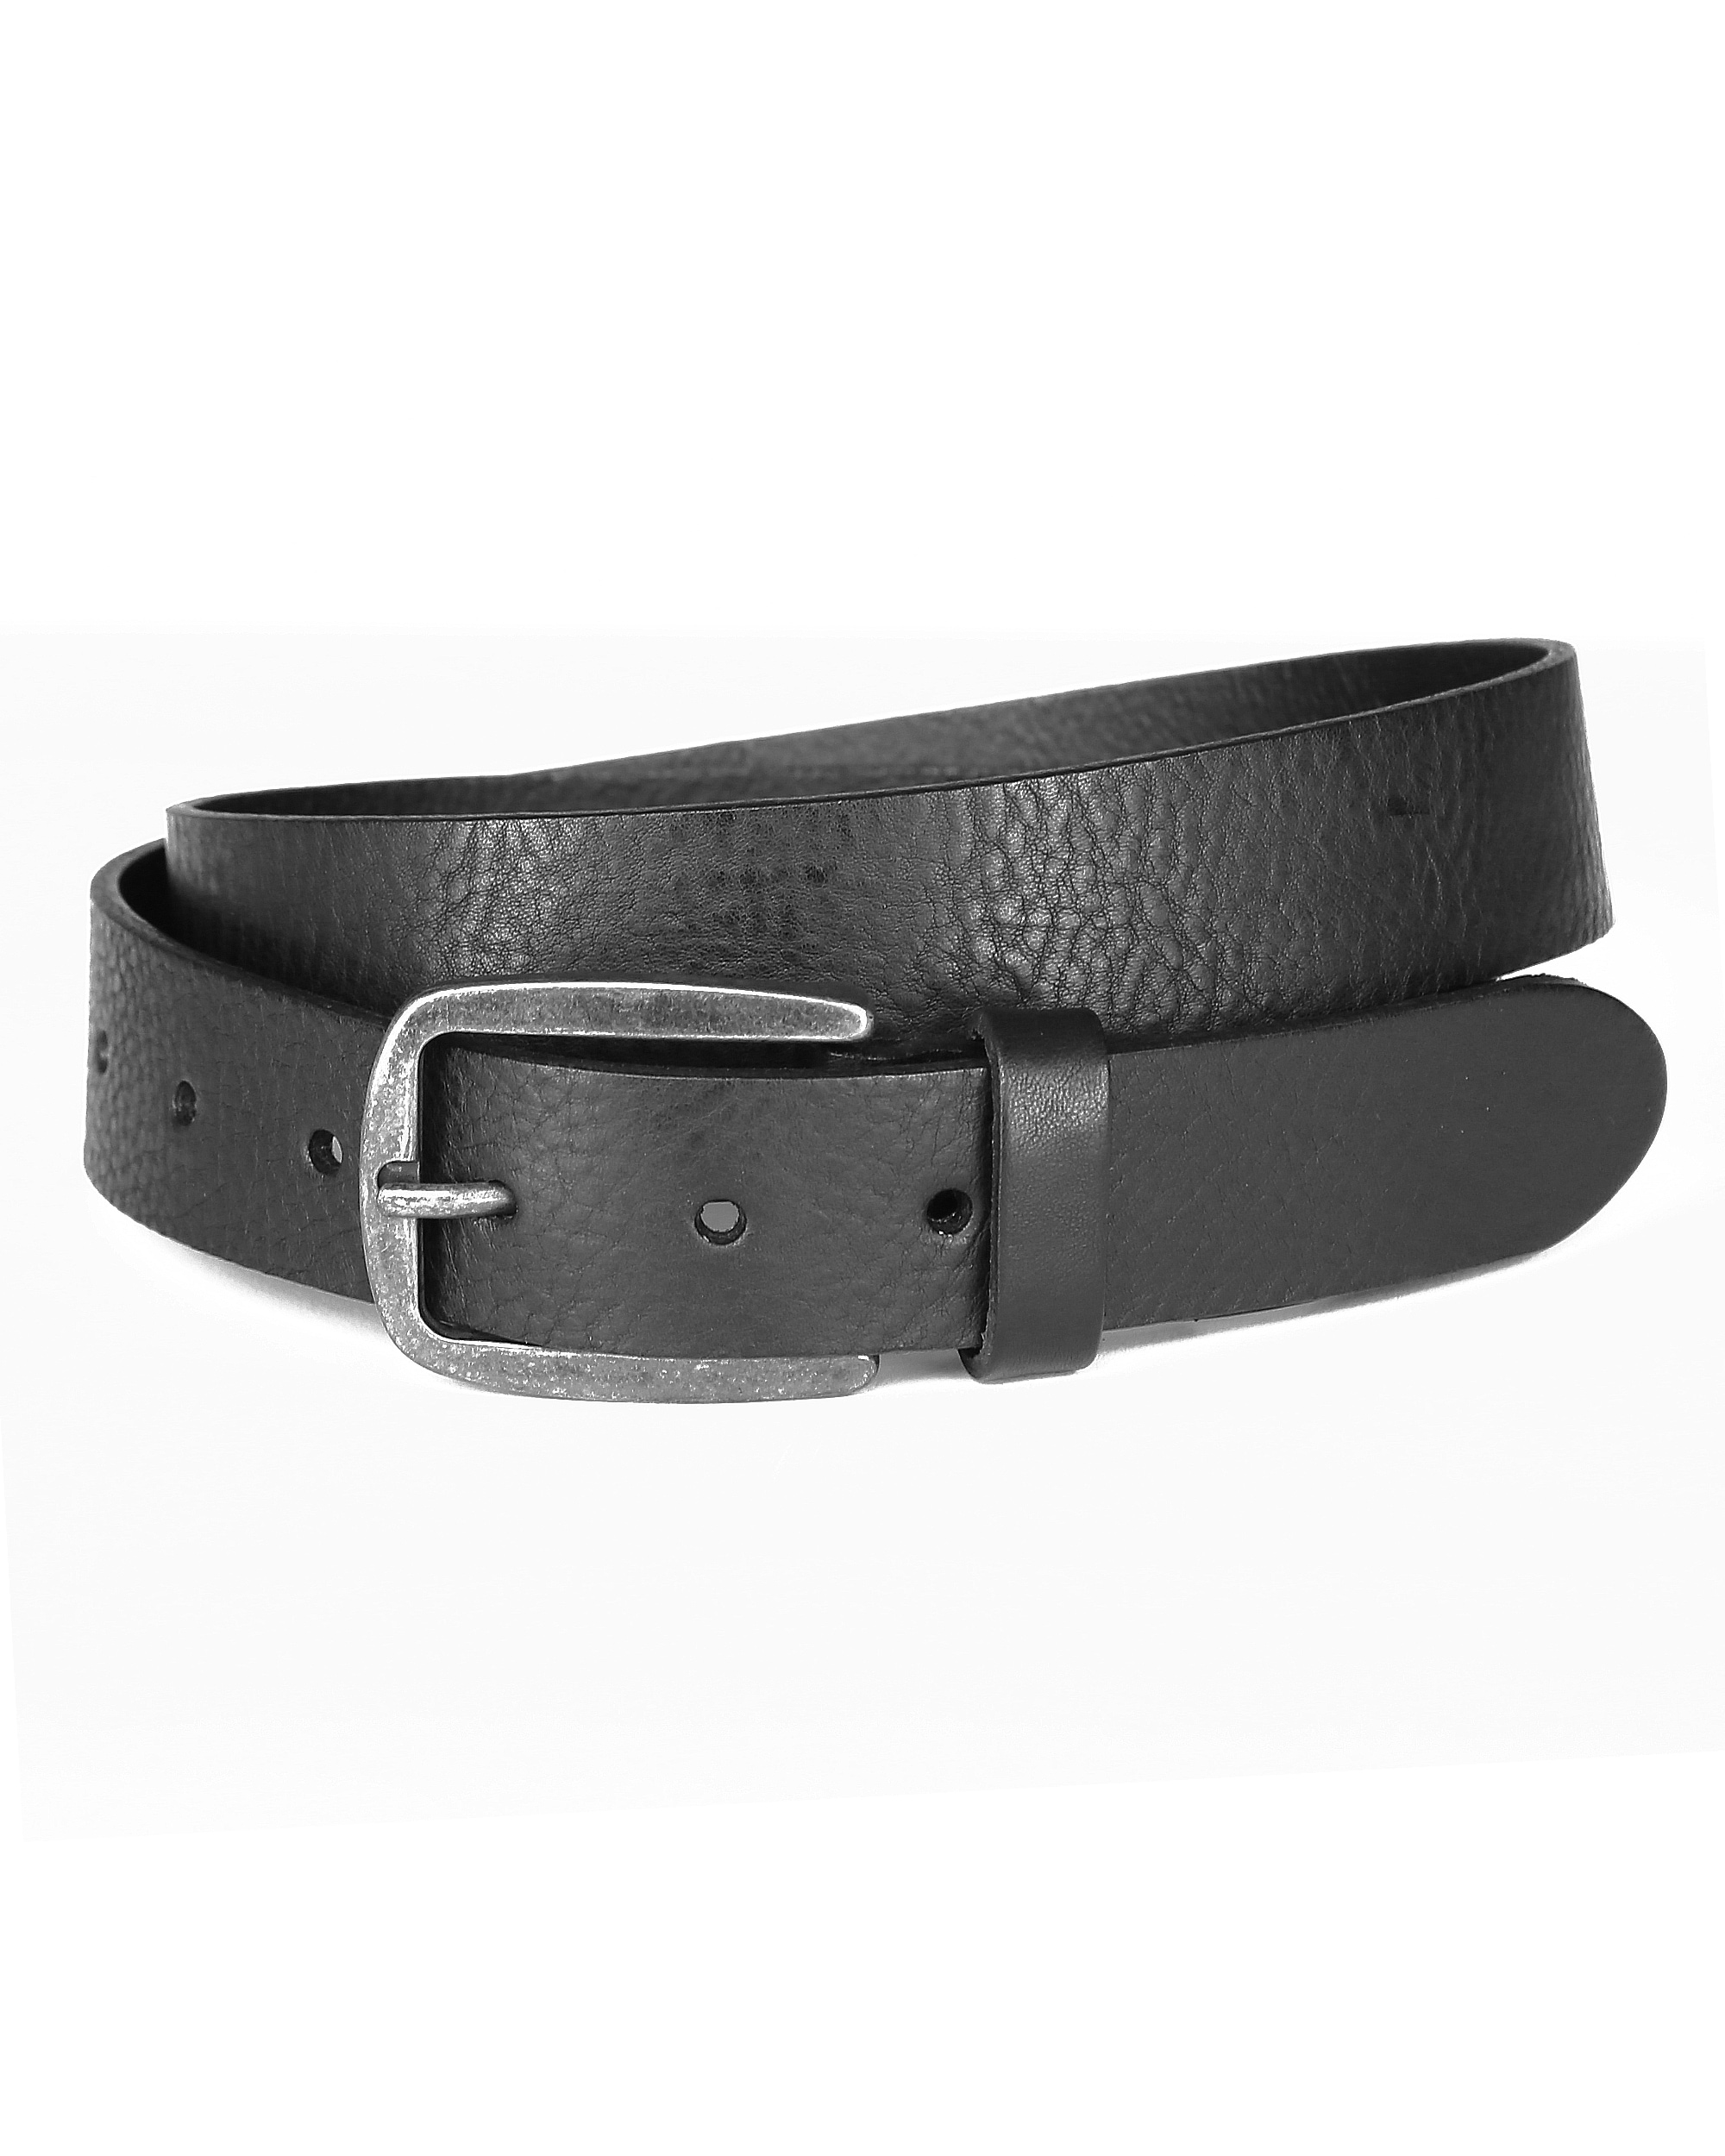 Maze Gürtel für Damen MG18-16 Damenmode/Schmuck & Accessoires/Accessoires/Gürtel/Ledergürtel